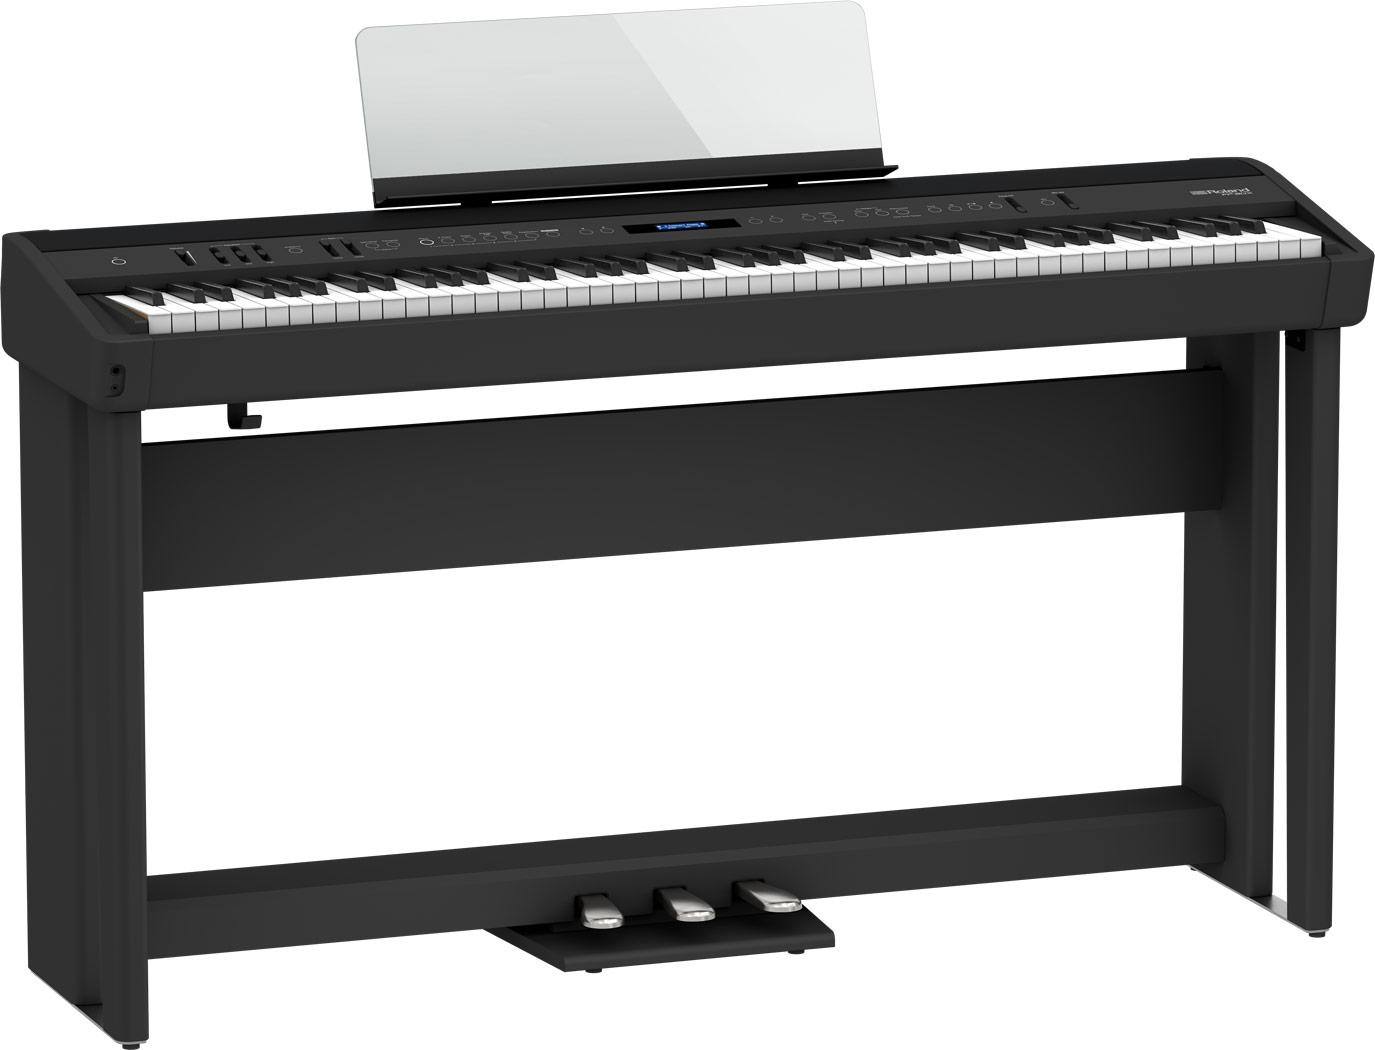 FP-90X Roland FP-90升級琴款 88鍵高階舞台型電鋼琴